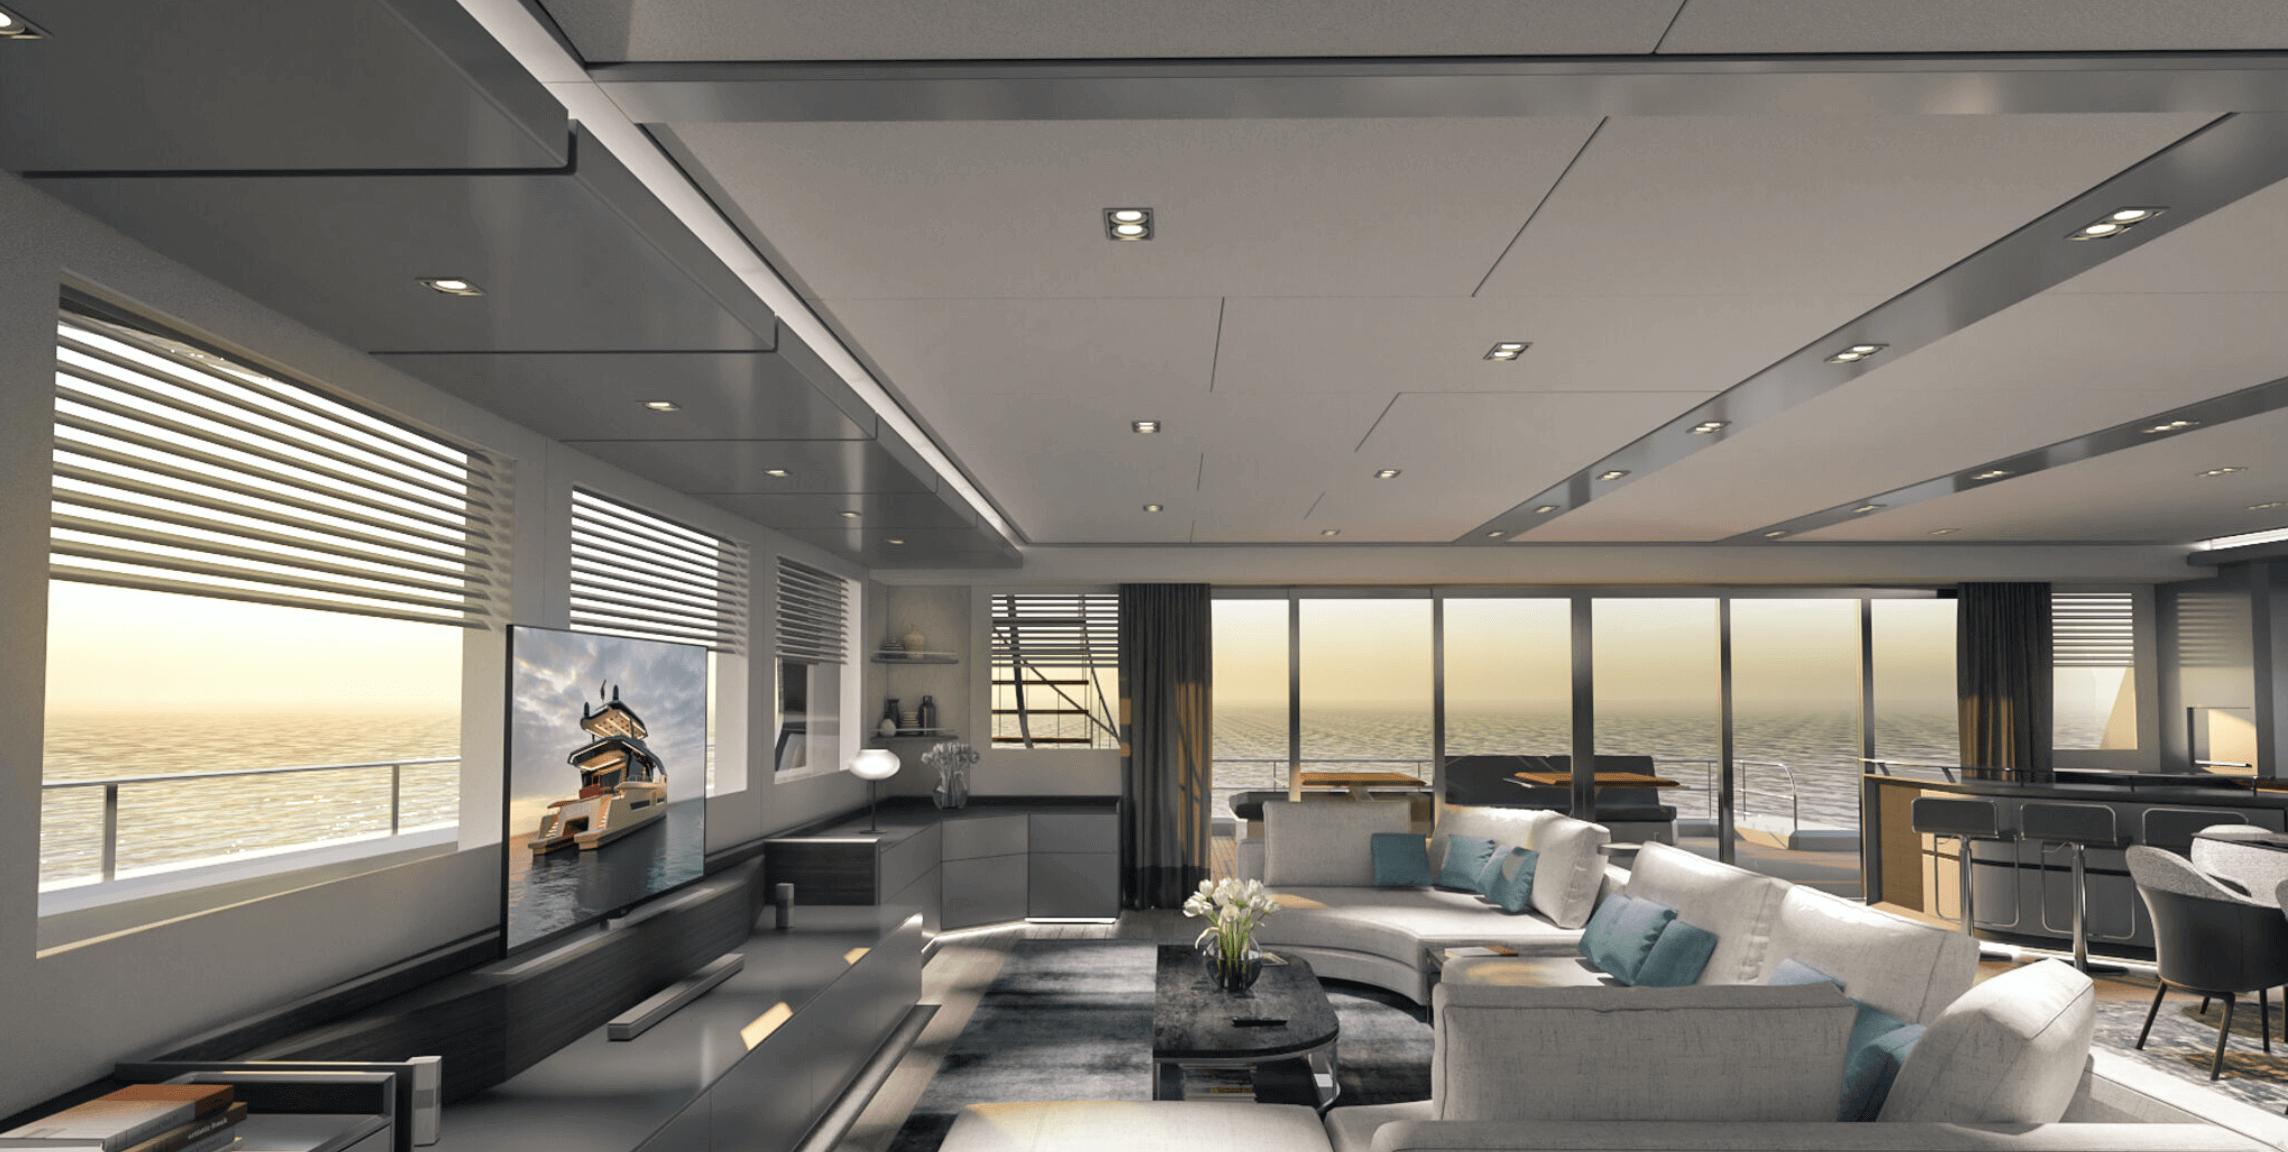 elektrikli alva yacht iç tasarım